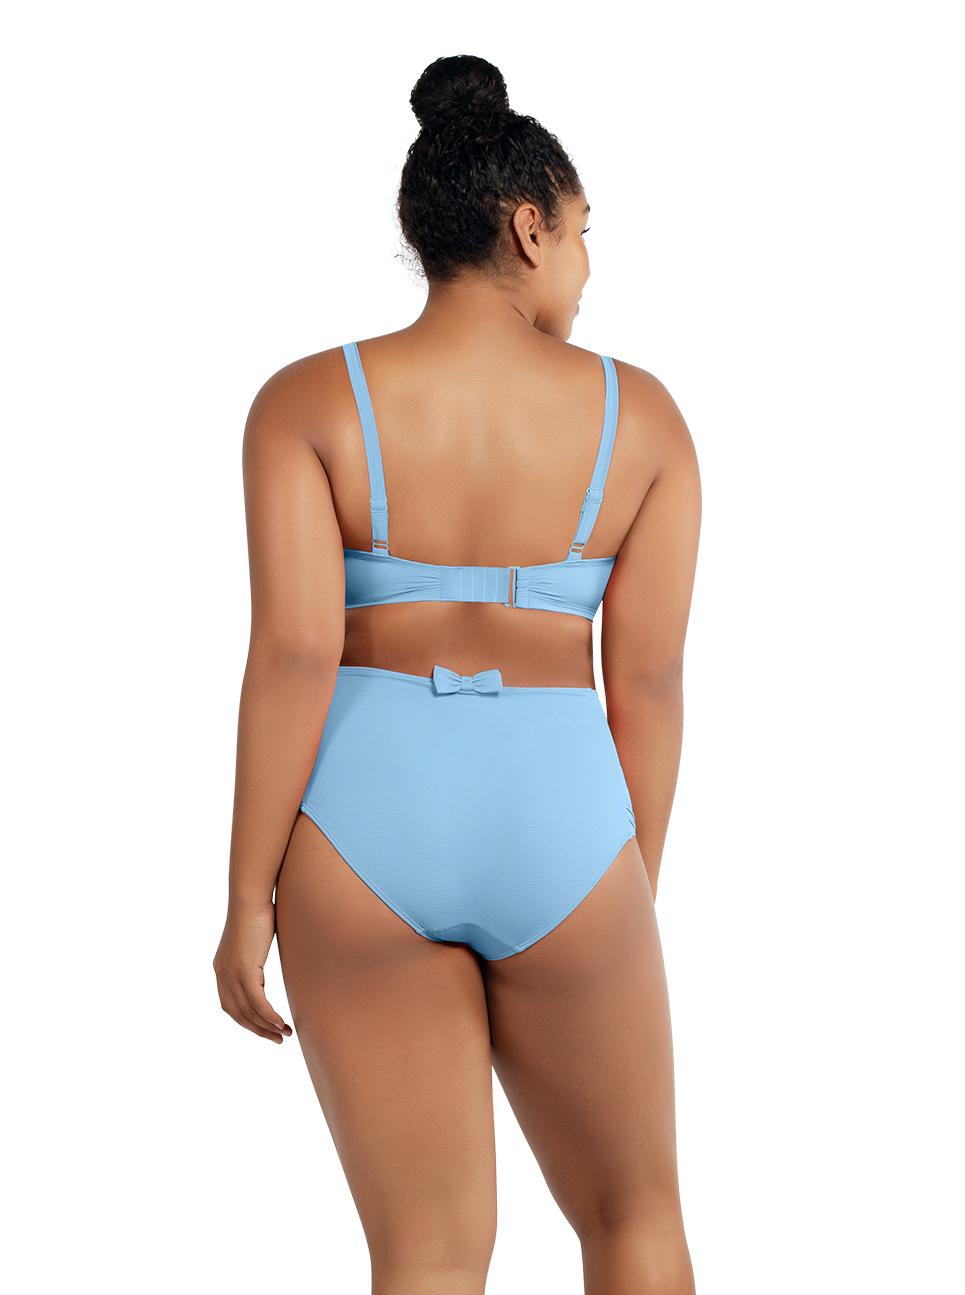 PARFAIT Vivien BalconetteBikiniTopS8162 HighwaistedBottomS8165 DreamBlue Black - Vivien Balconette Bikini Top Dream Blue S8162